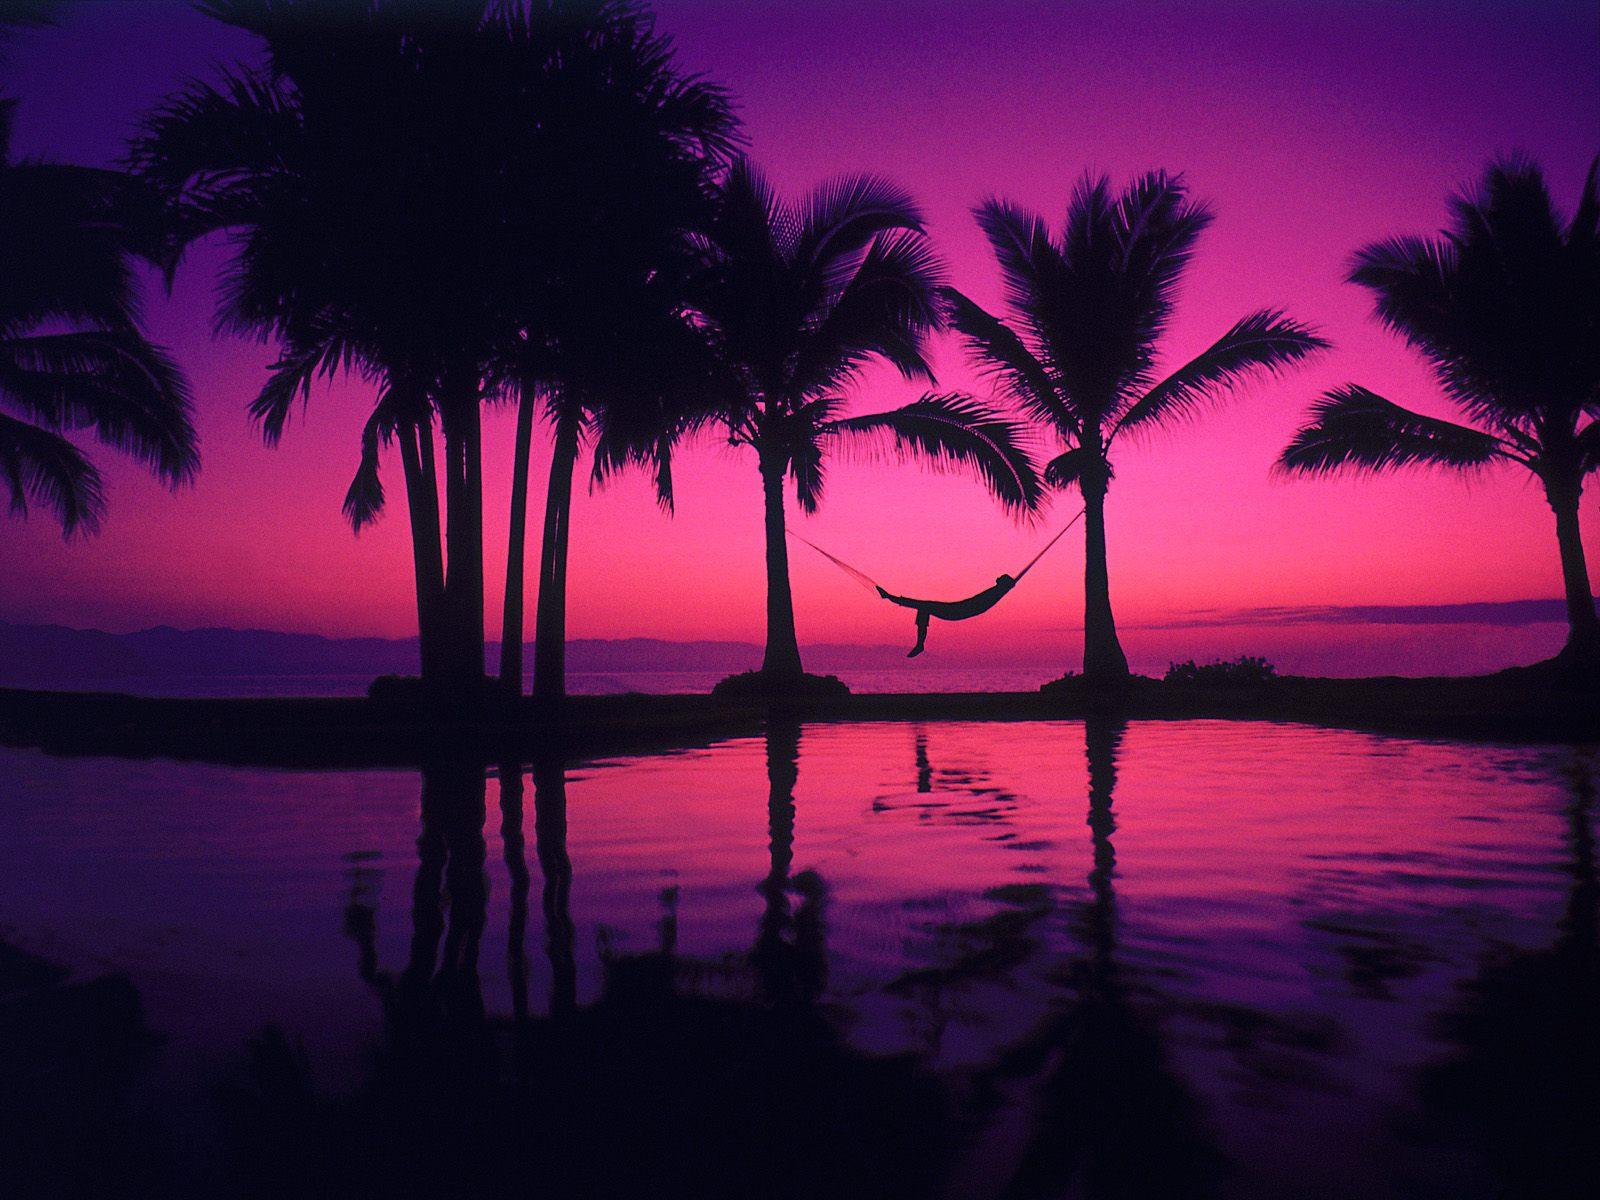 sunset wallpaper hd beautiful sunset wallpaper hd beautiful sunset 1600x1200